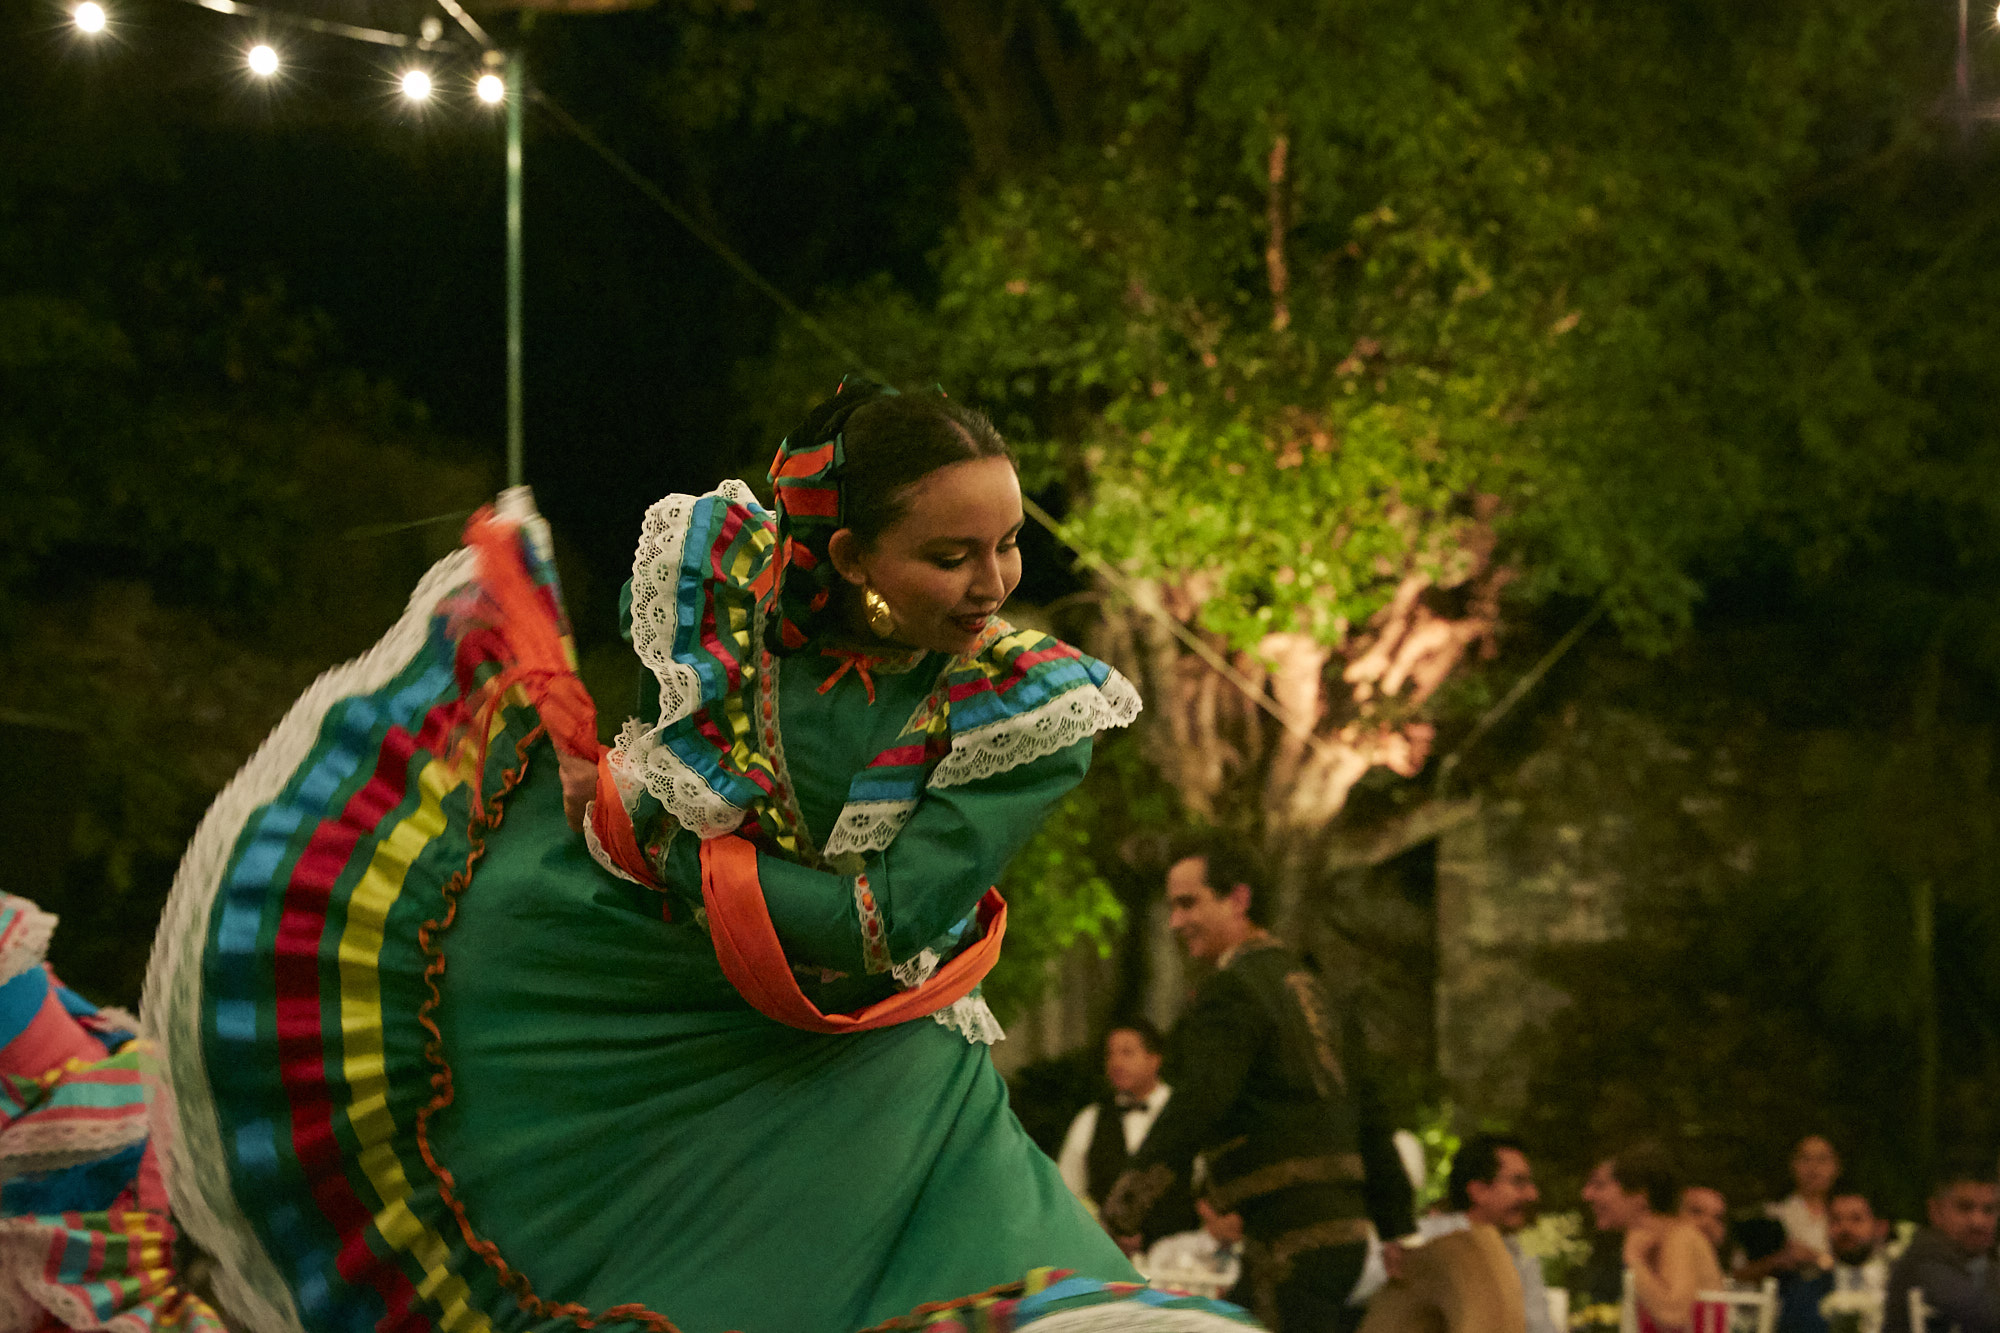 LJL_GabbyandIVan_Mexico_090.jpg